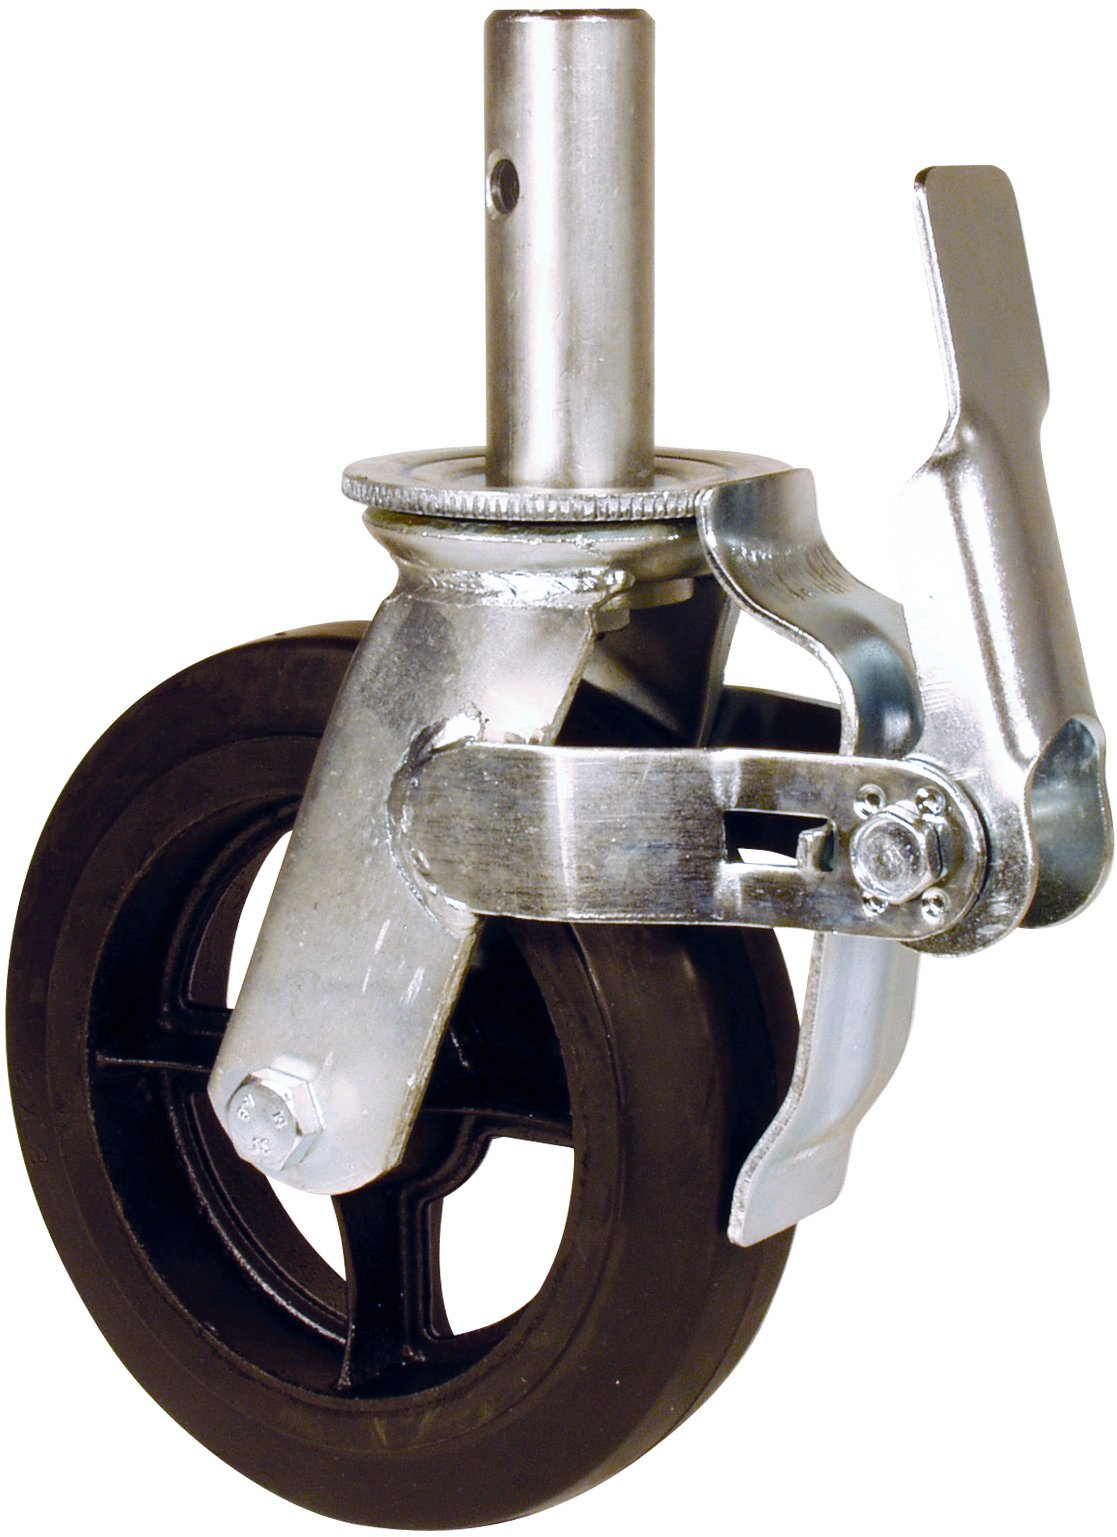 RWM Casters Locking Stem Scaffold Caster, Swivel with Lock, Rubber on Iron Wheel, Roller Bearing, 500 lbs Capacity, 8'' Wheel Dia, 2'' Wheel Width, 9-1/4'' Mount Height, 1-3/8'' Stem Dia, 3-3/4'' Stem Height by RWM Casters